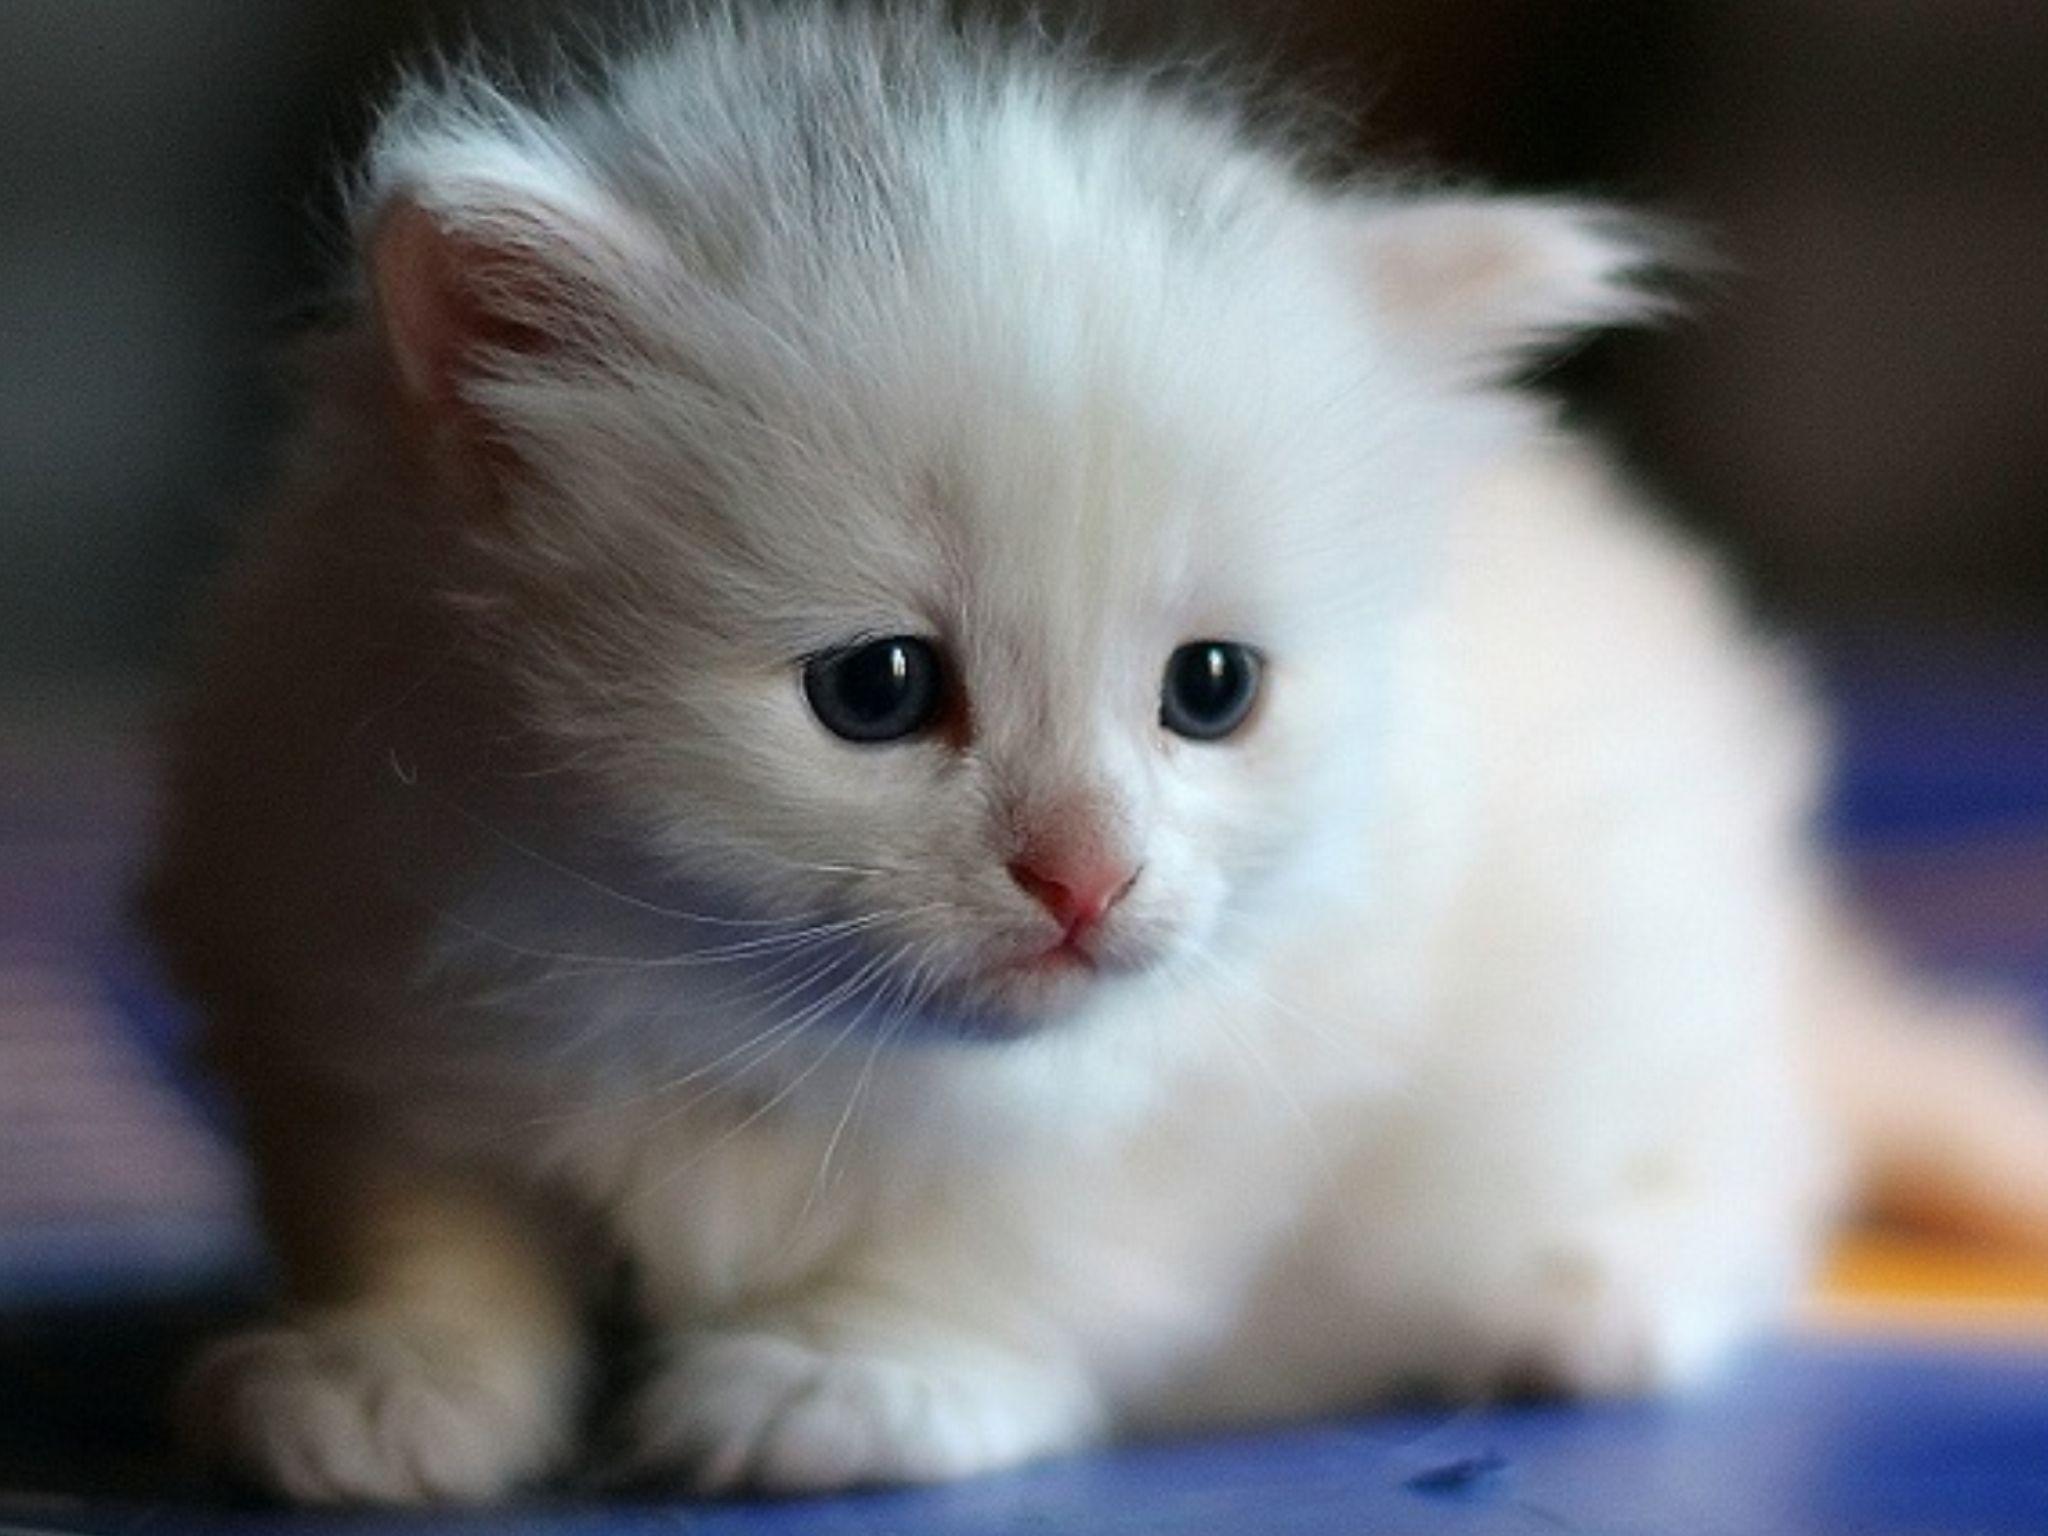 Pin By Susan Munoz On Love Love Love Cute Animals Animals Beautiful Cats